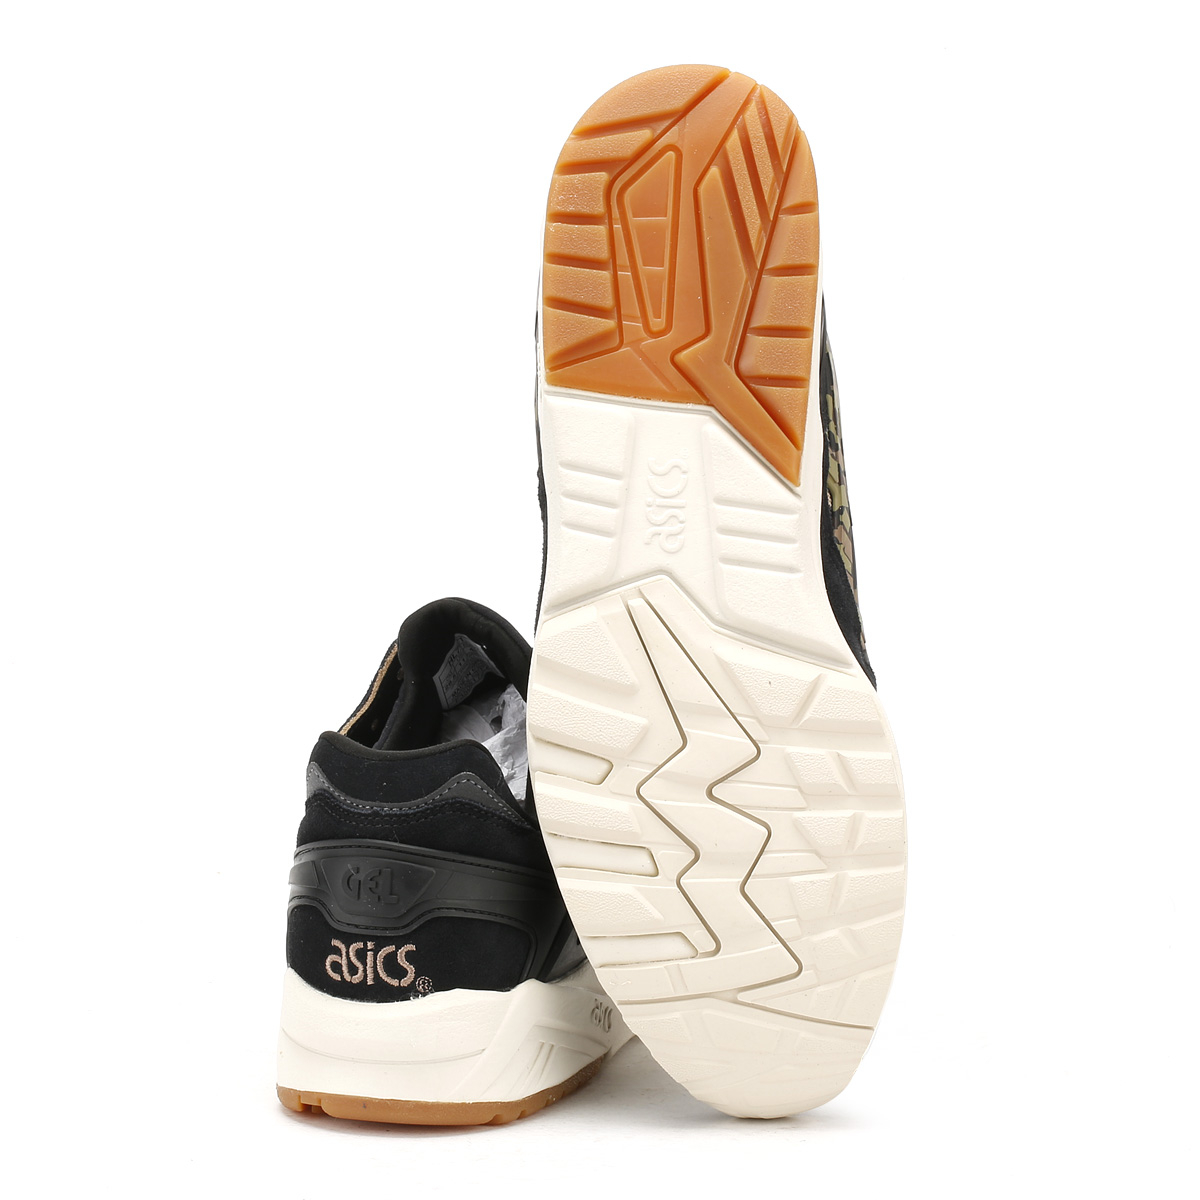 ed94926271c3 ... Nike Air Jordan 9 IX IX IX Retro City of Flight LA All Star Size 11 ...